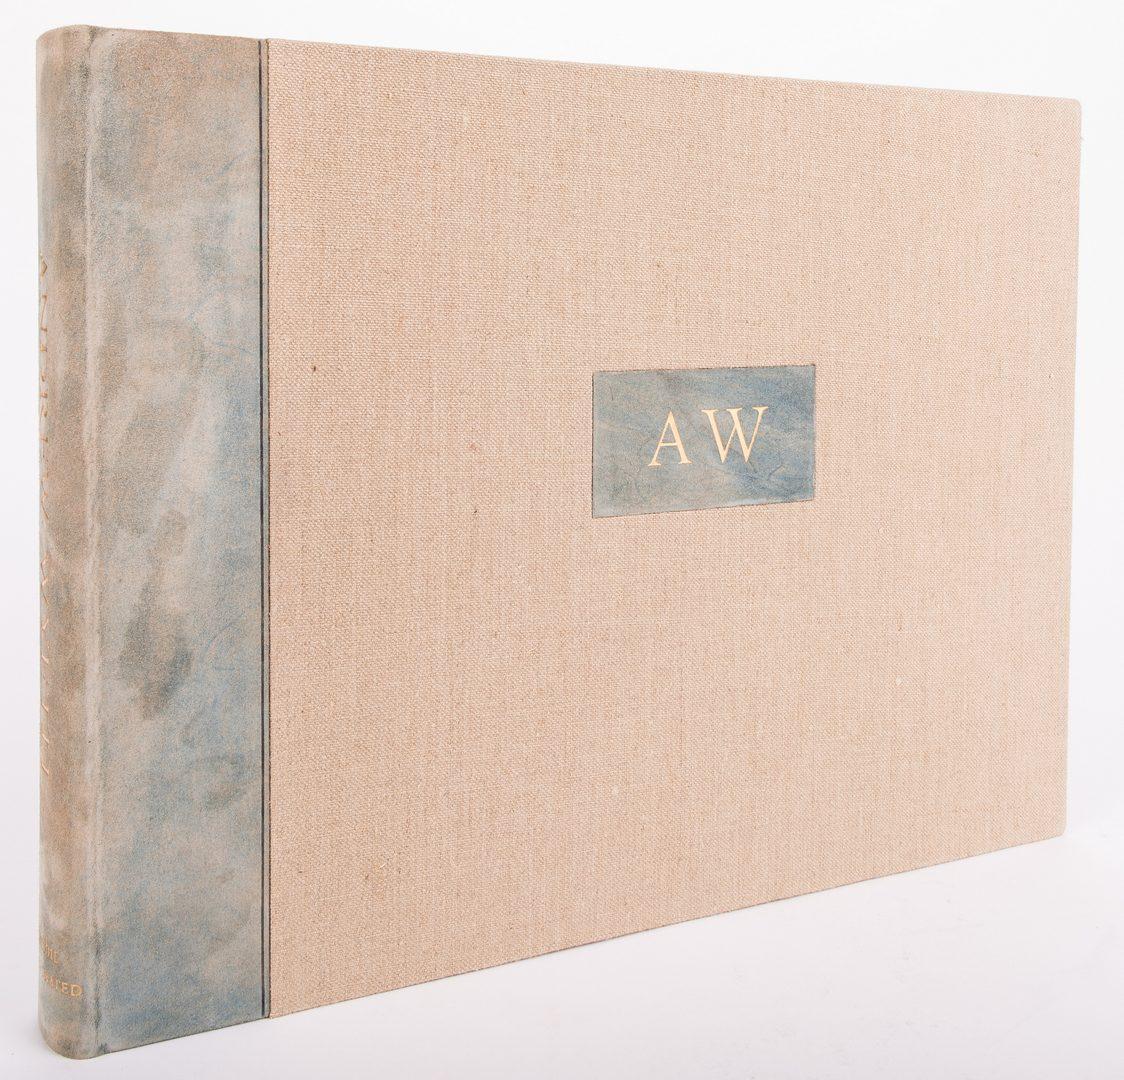 Lot 488: Ltd. ed. Wyeth Book, Artist Signed